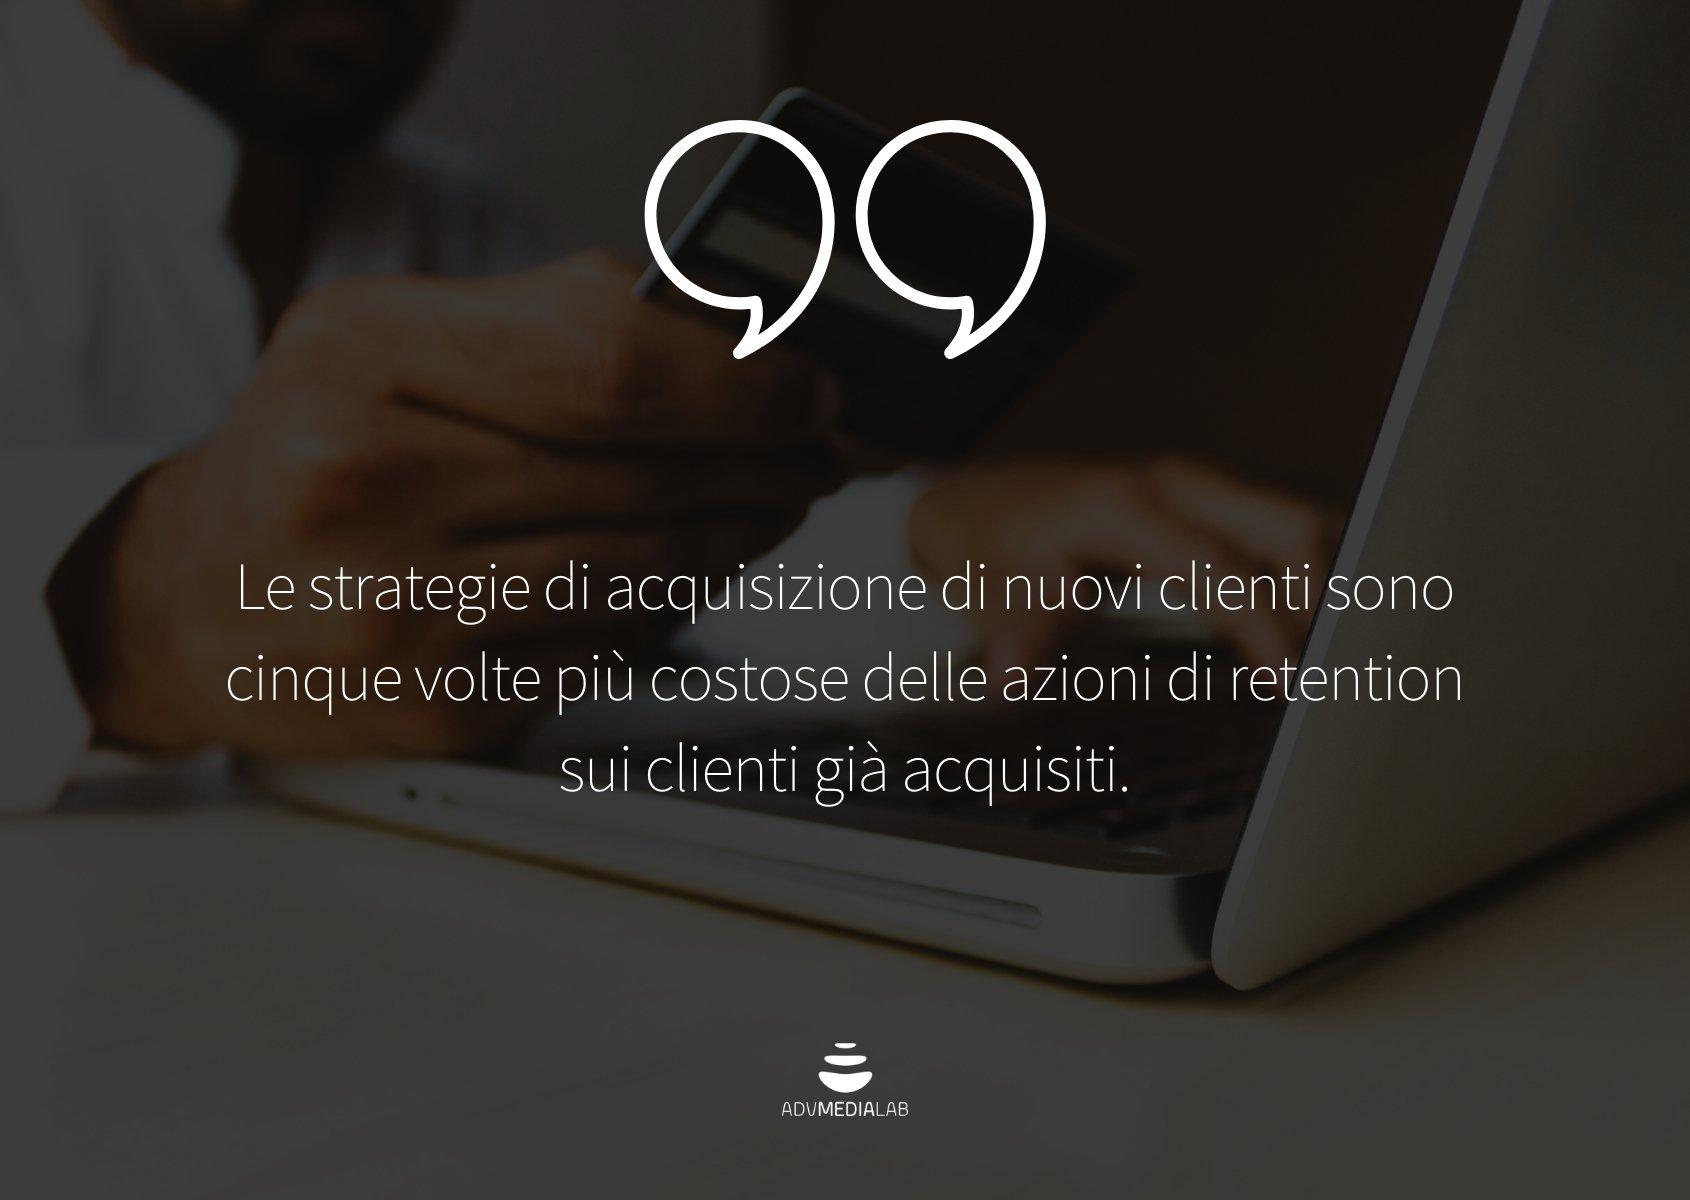 Customer-retention-quote